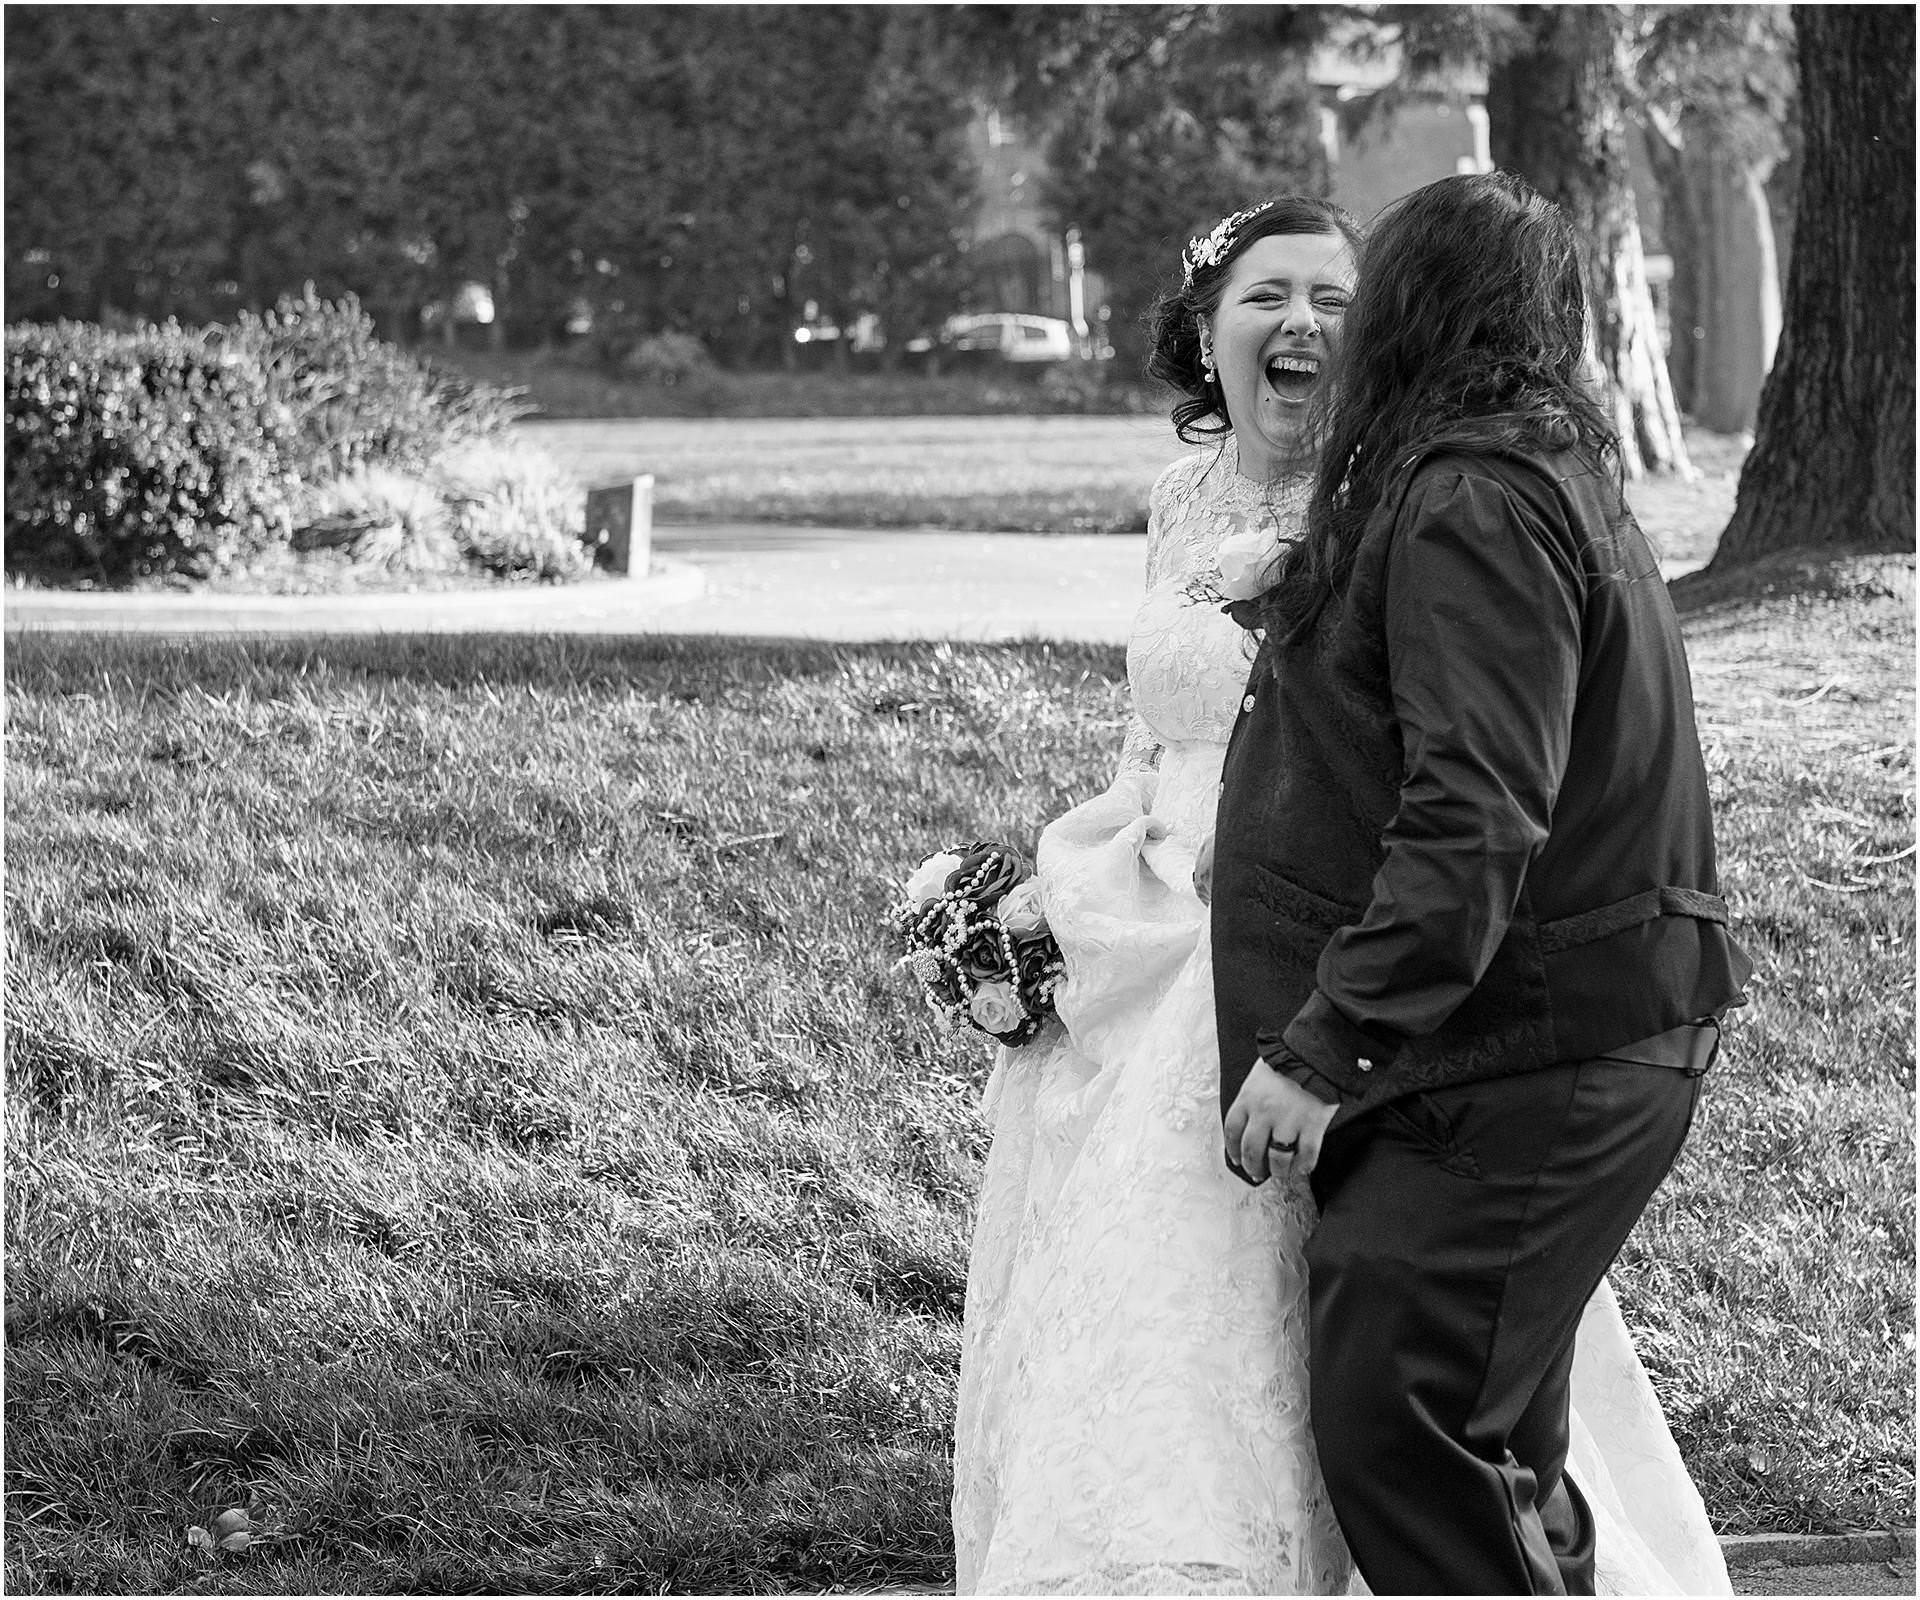 wedding_photography at dukinfield_townhall with sarah_bee_photography dukinfield_park dukinfeild_cheshire_2010.jpg